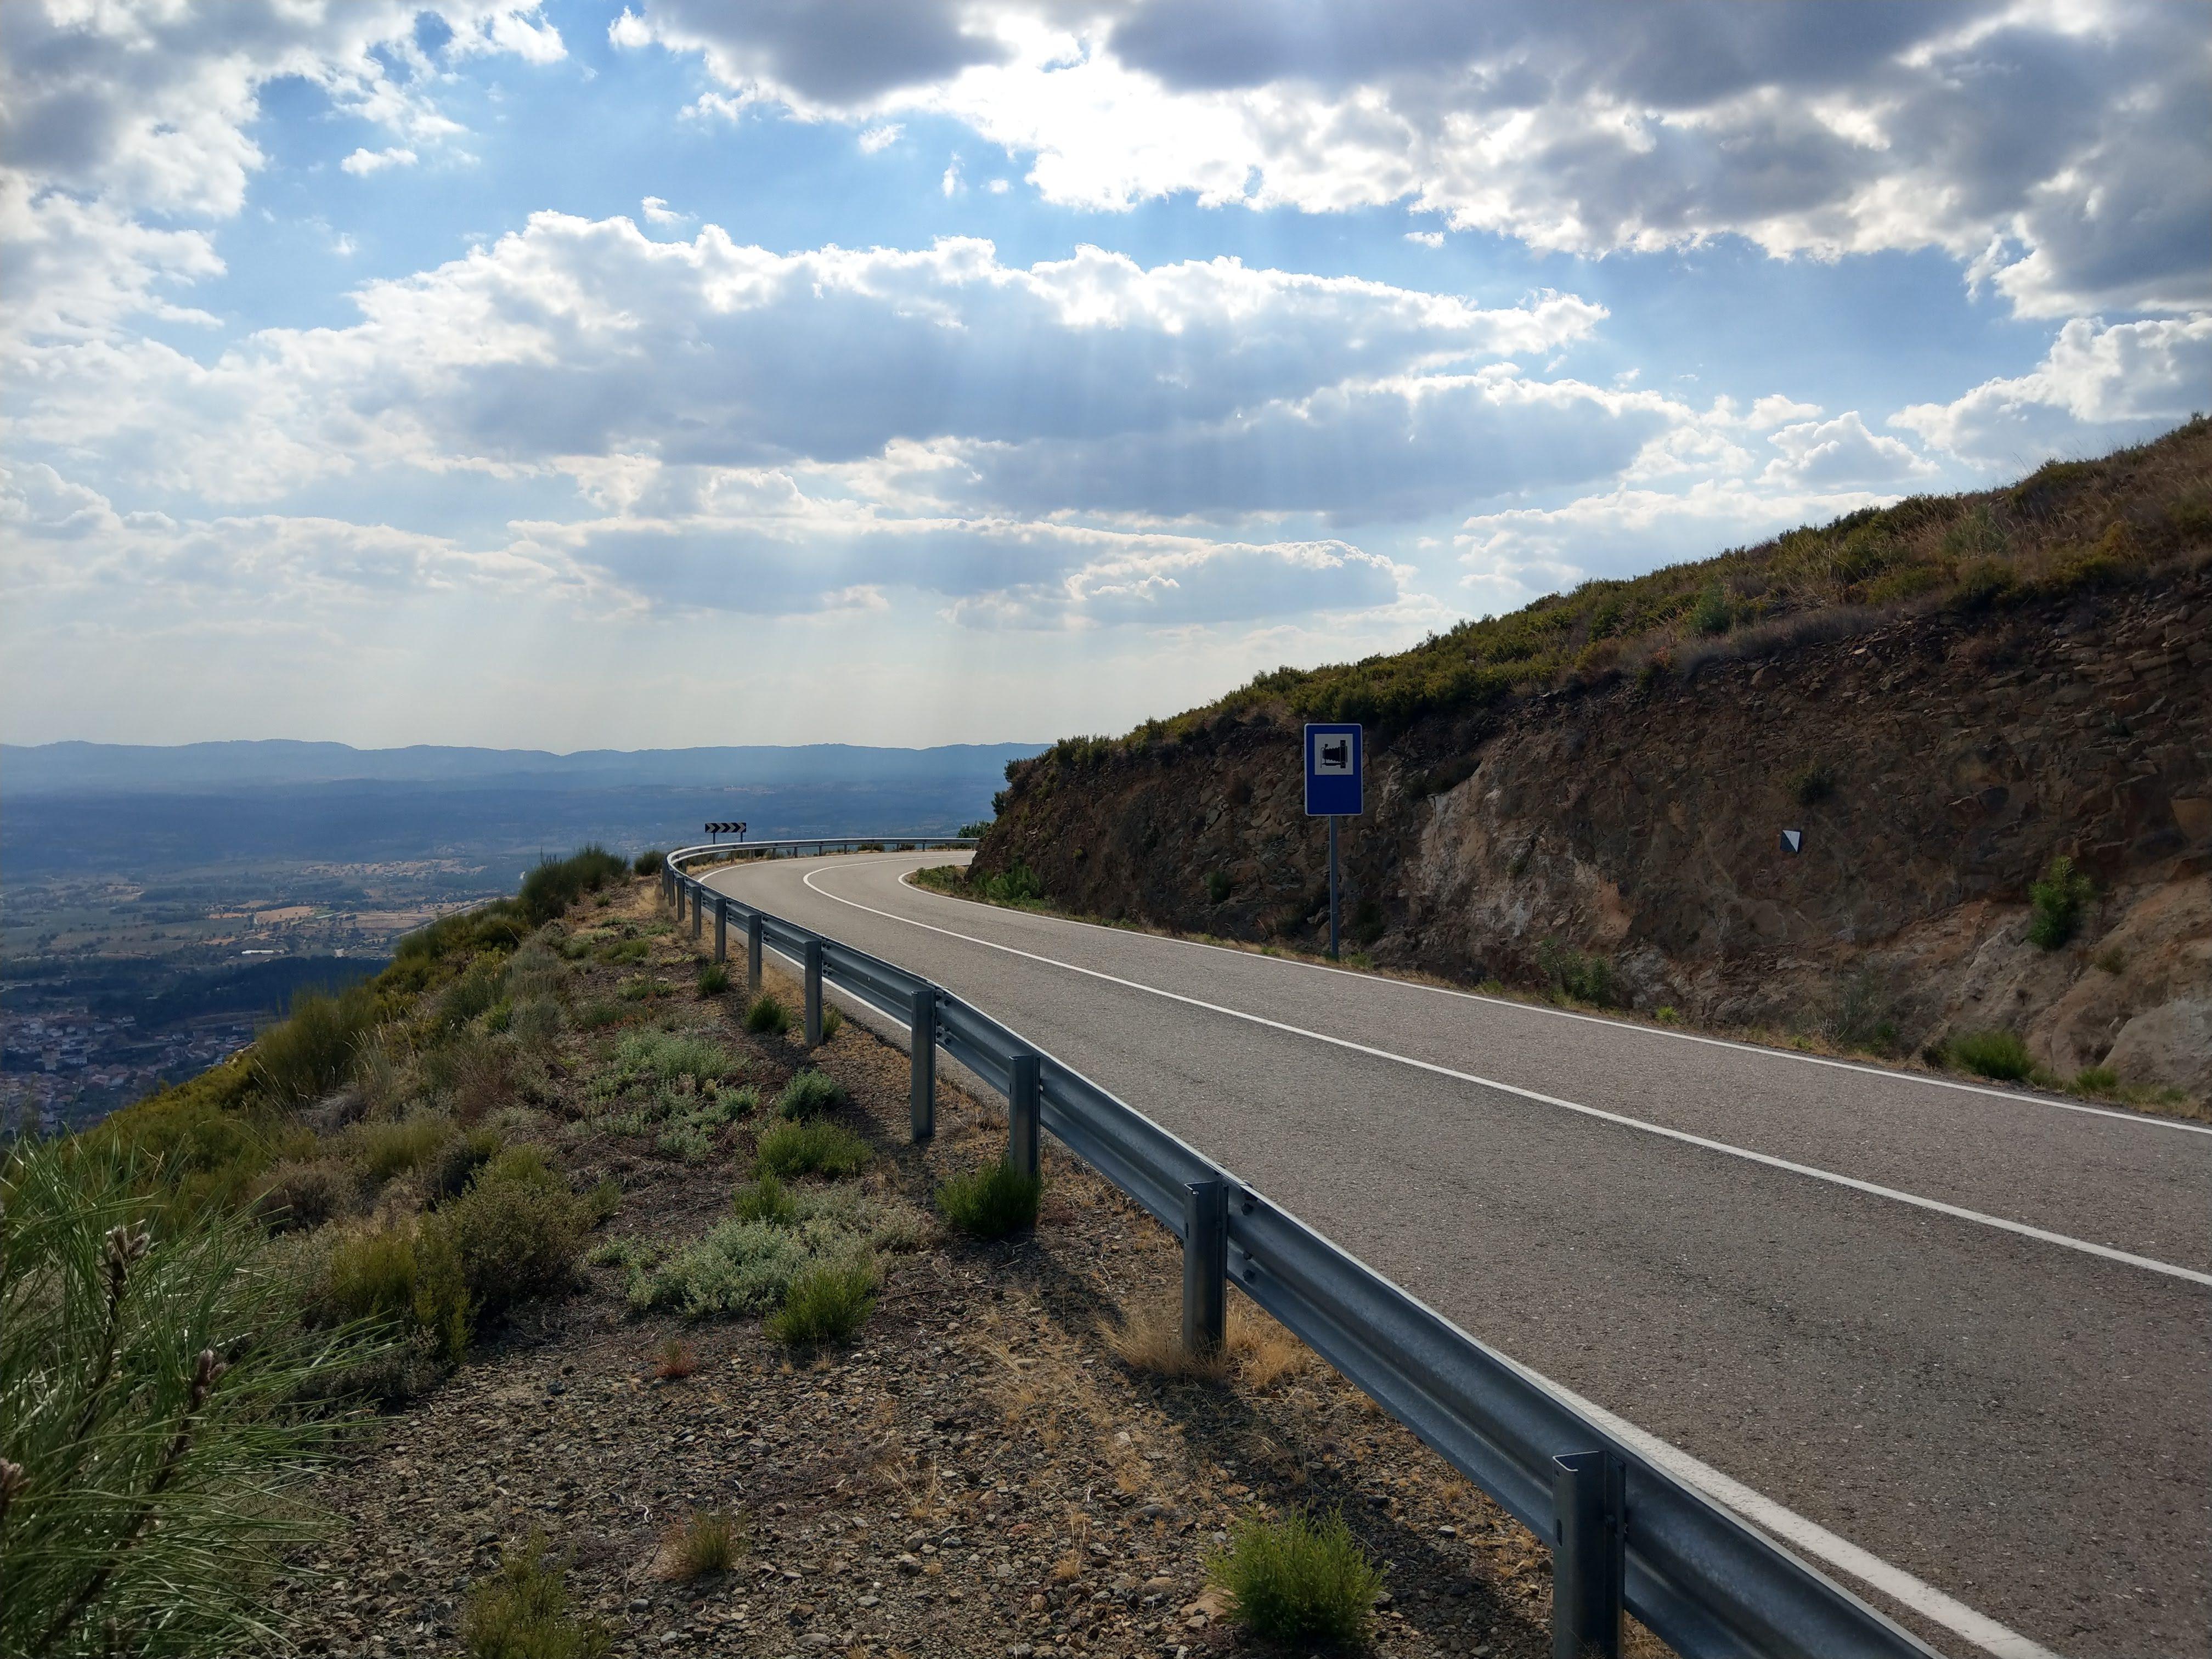 Abfahrt nach Valverde del Fresno